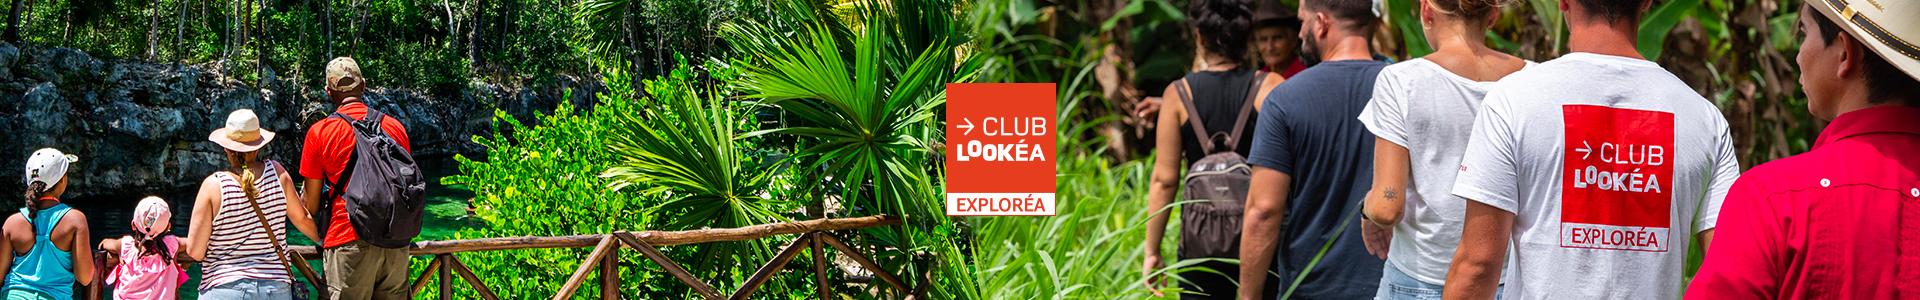 Club Lookéa Exploréa